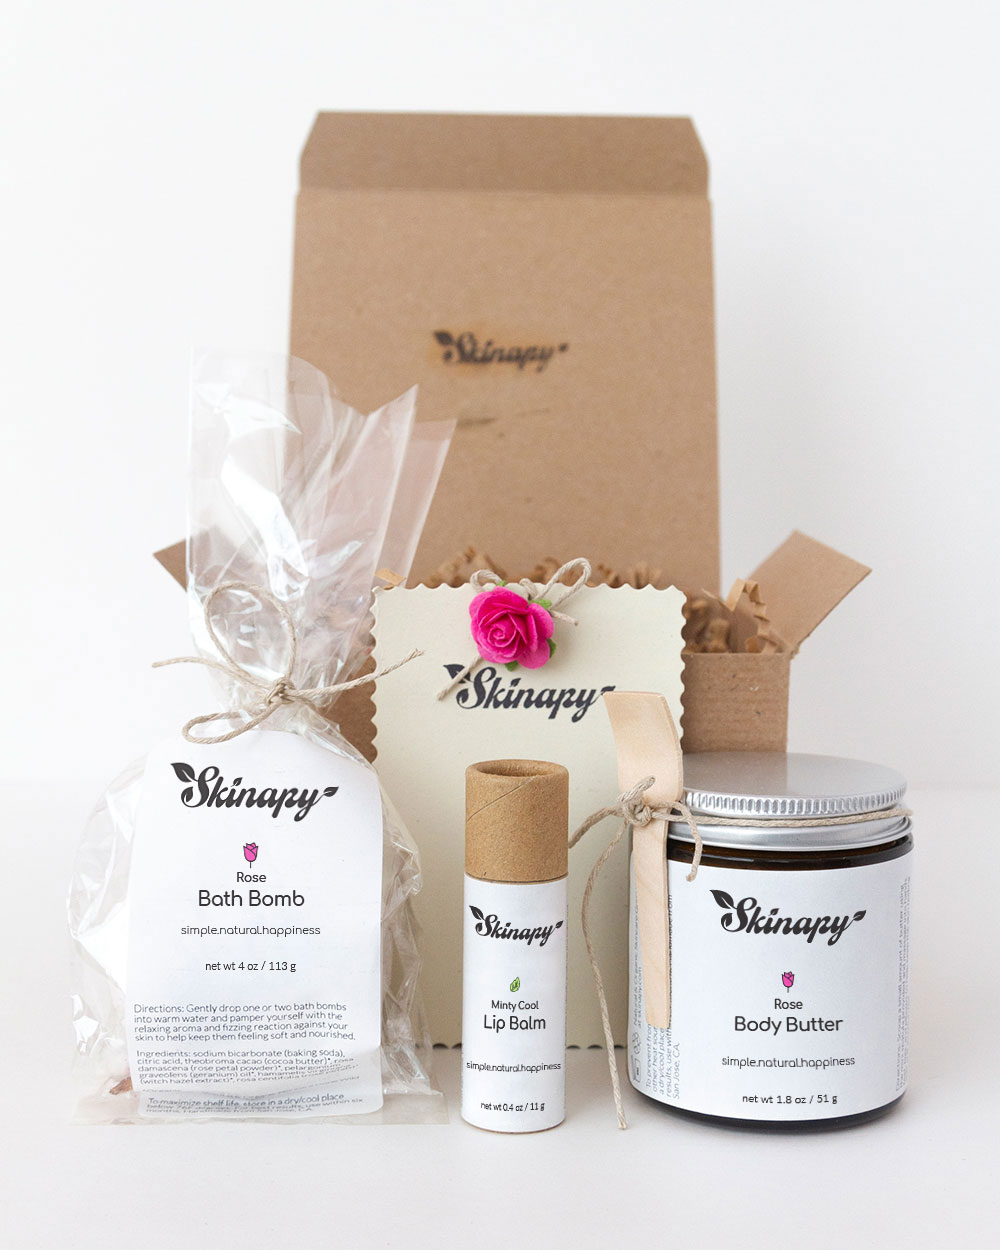 Natural & organic essential body bath rose gift set or gift box